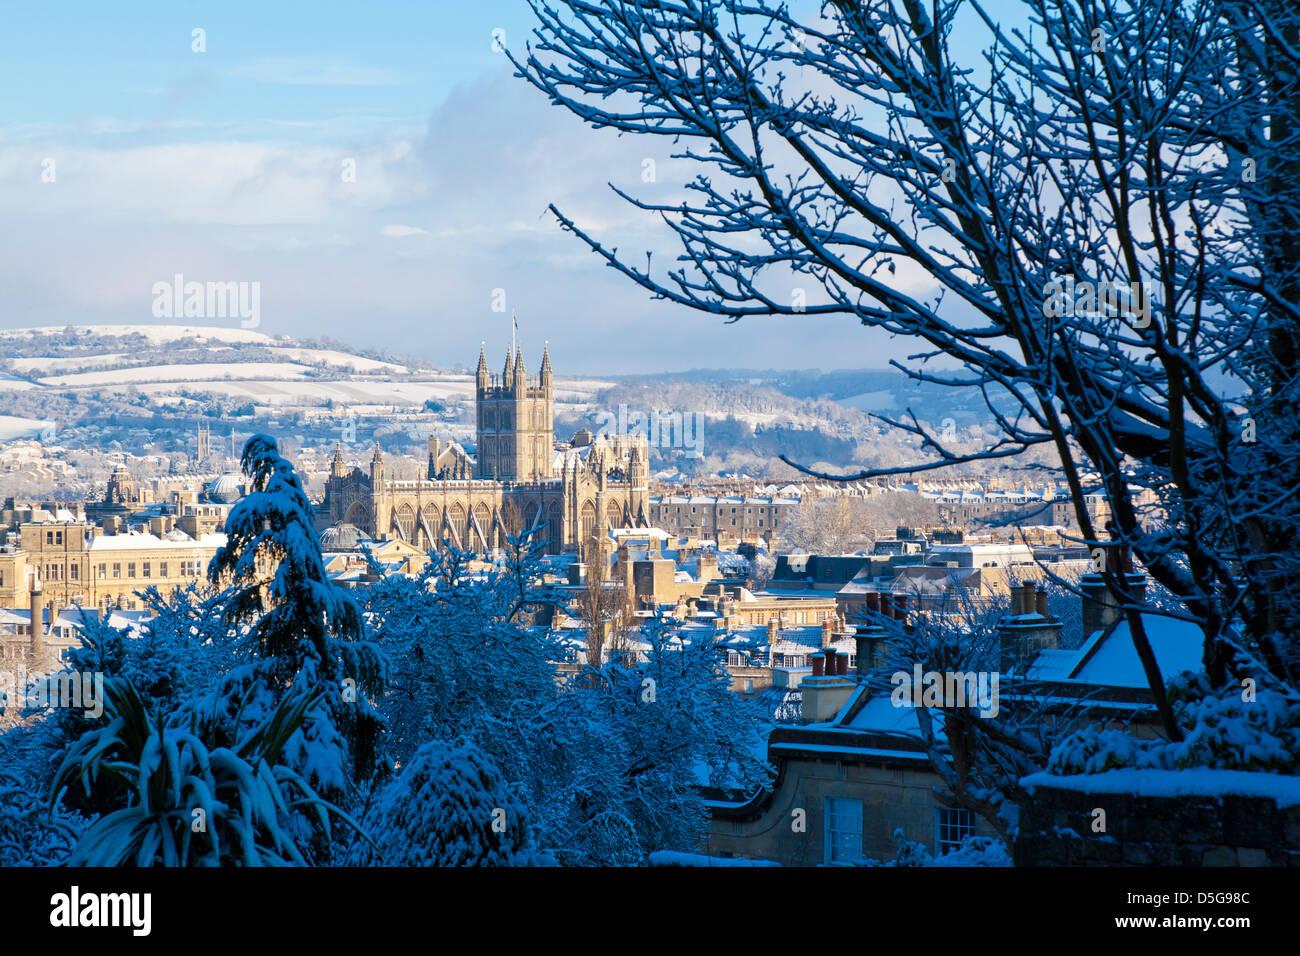 winter-scenic-showing-bath-abbey-surroun